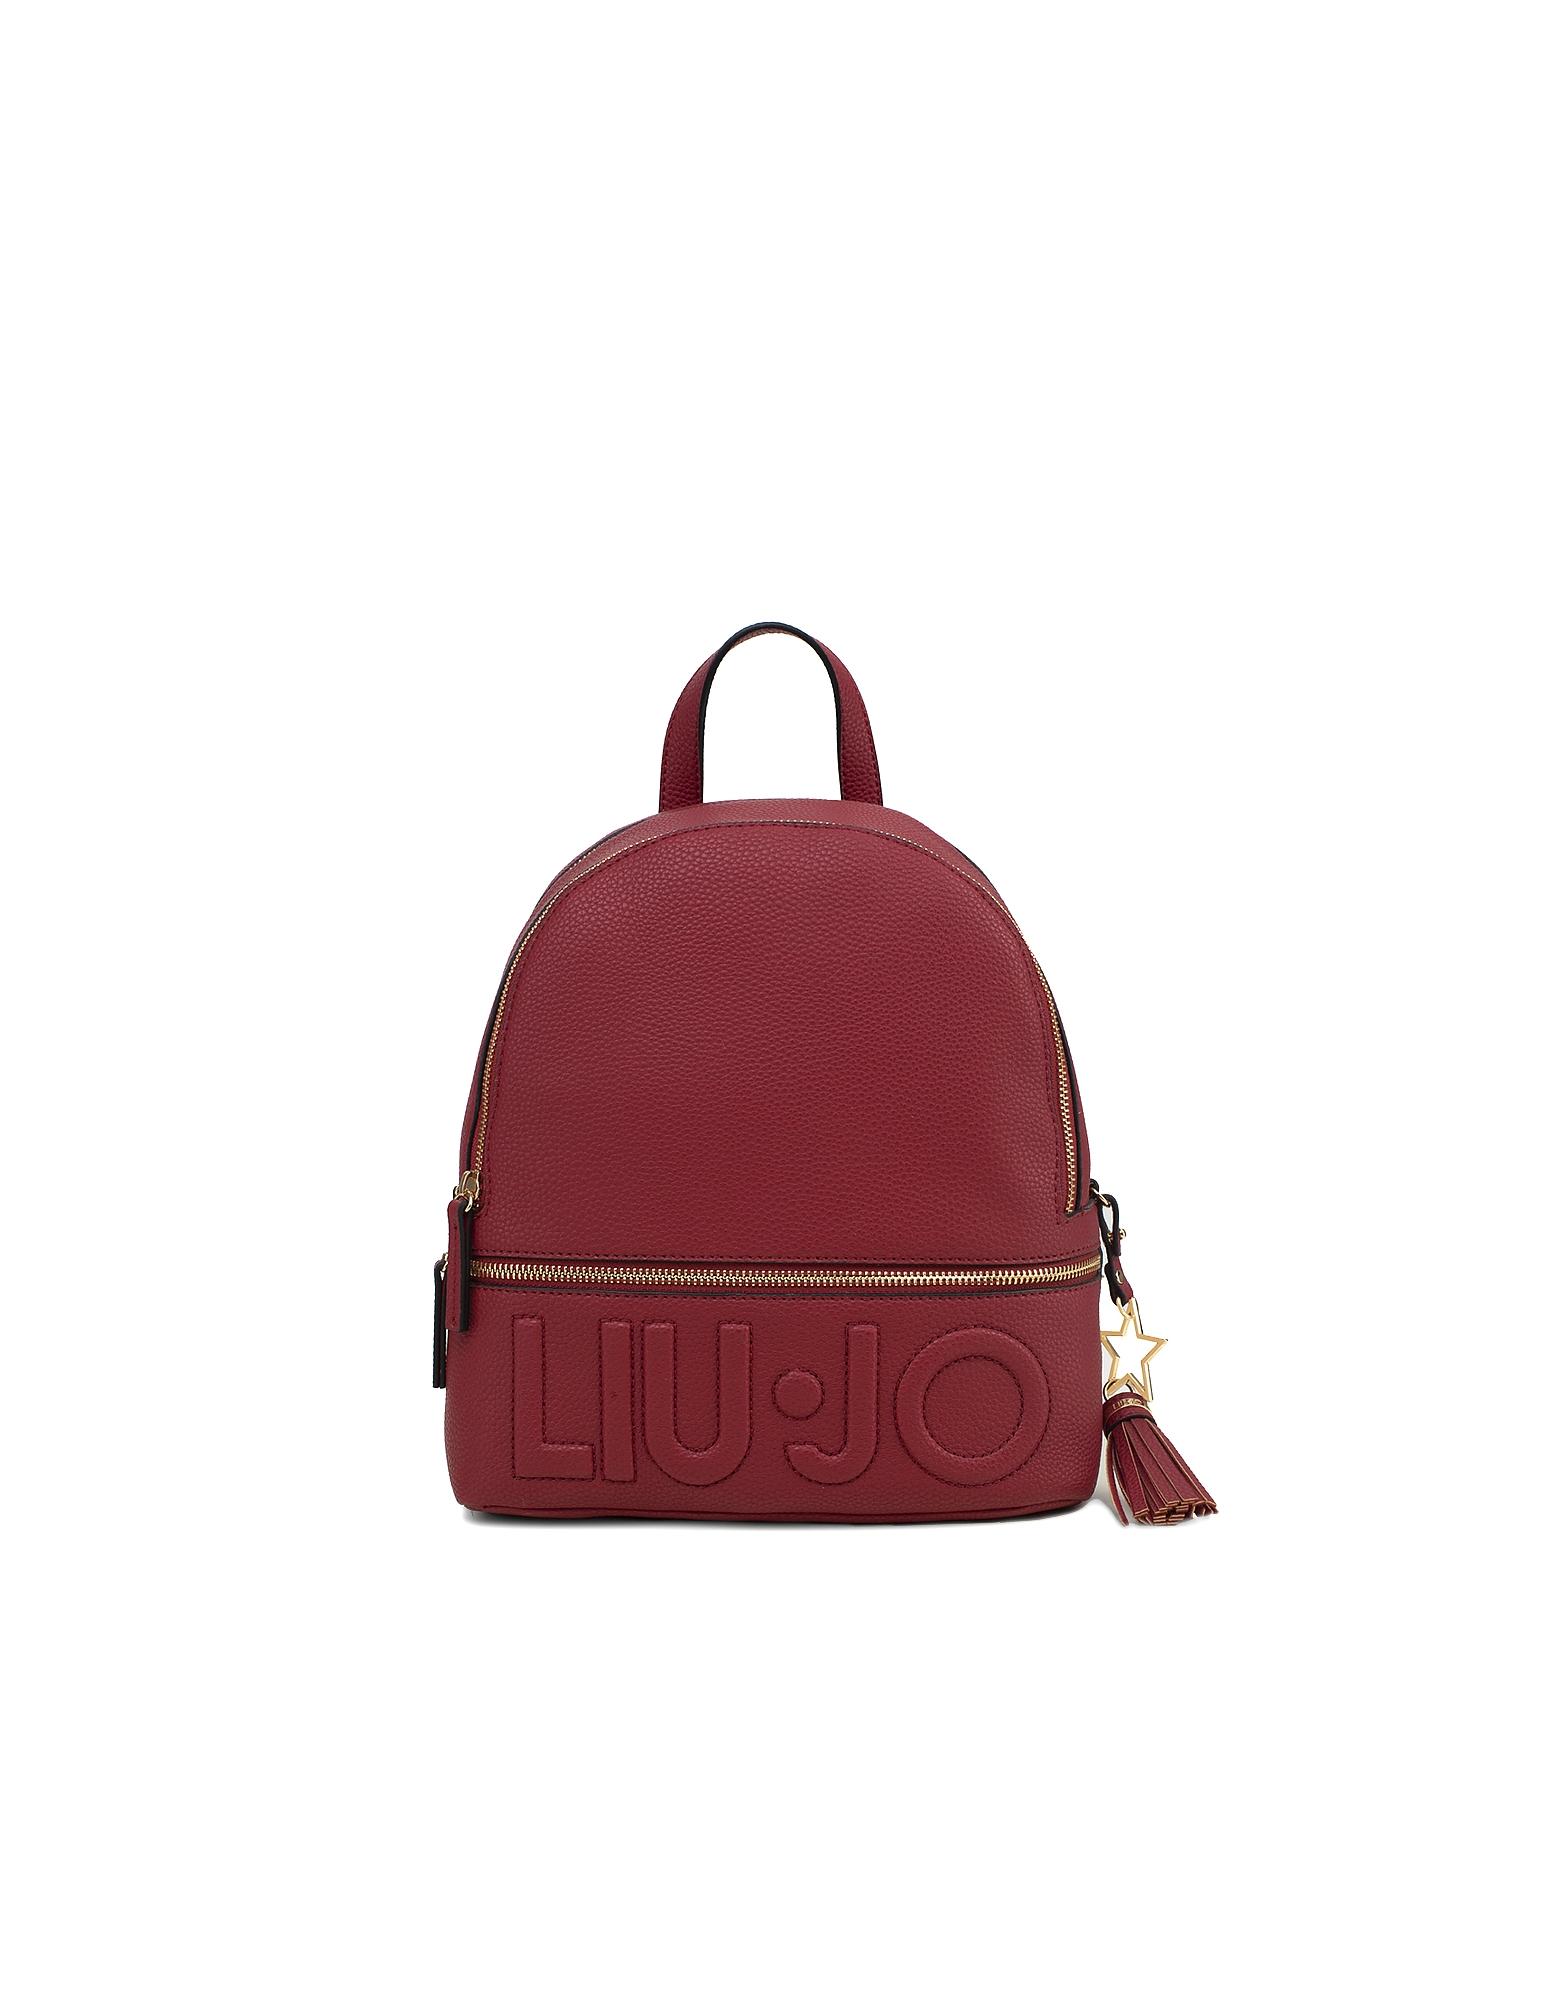 Liu Jo Designer Handbags, Women's Red Backpack